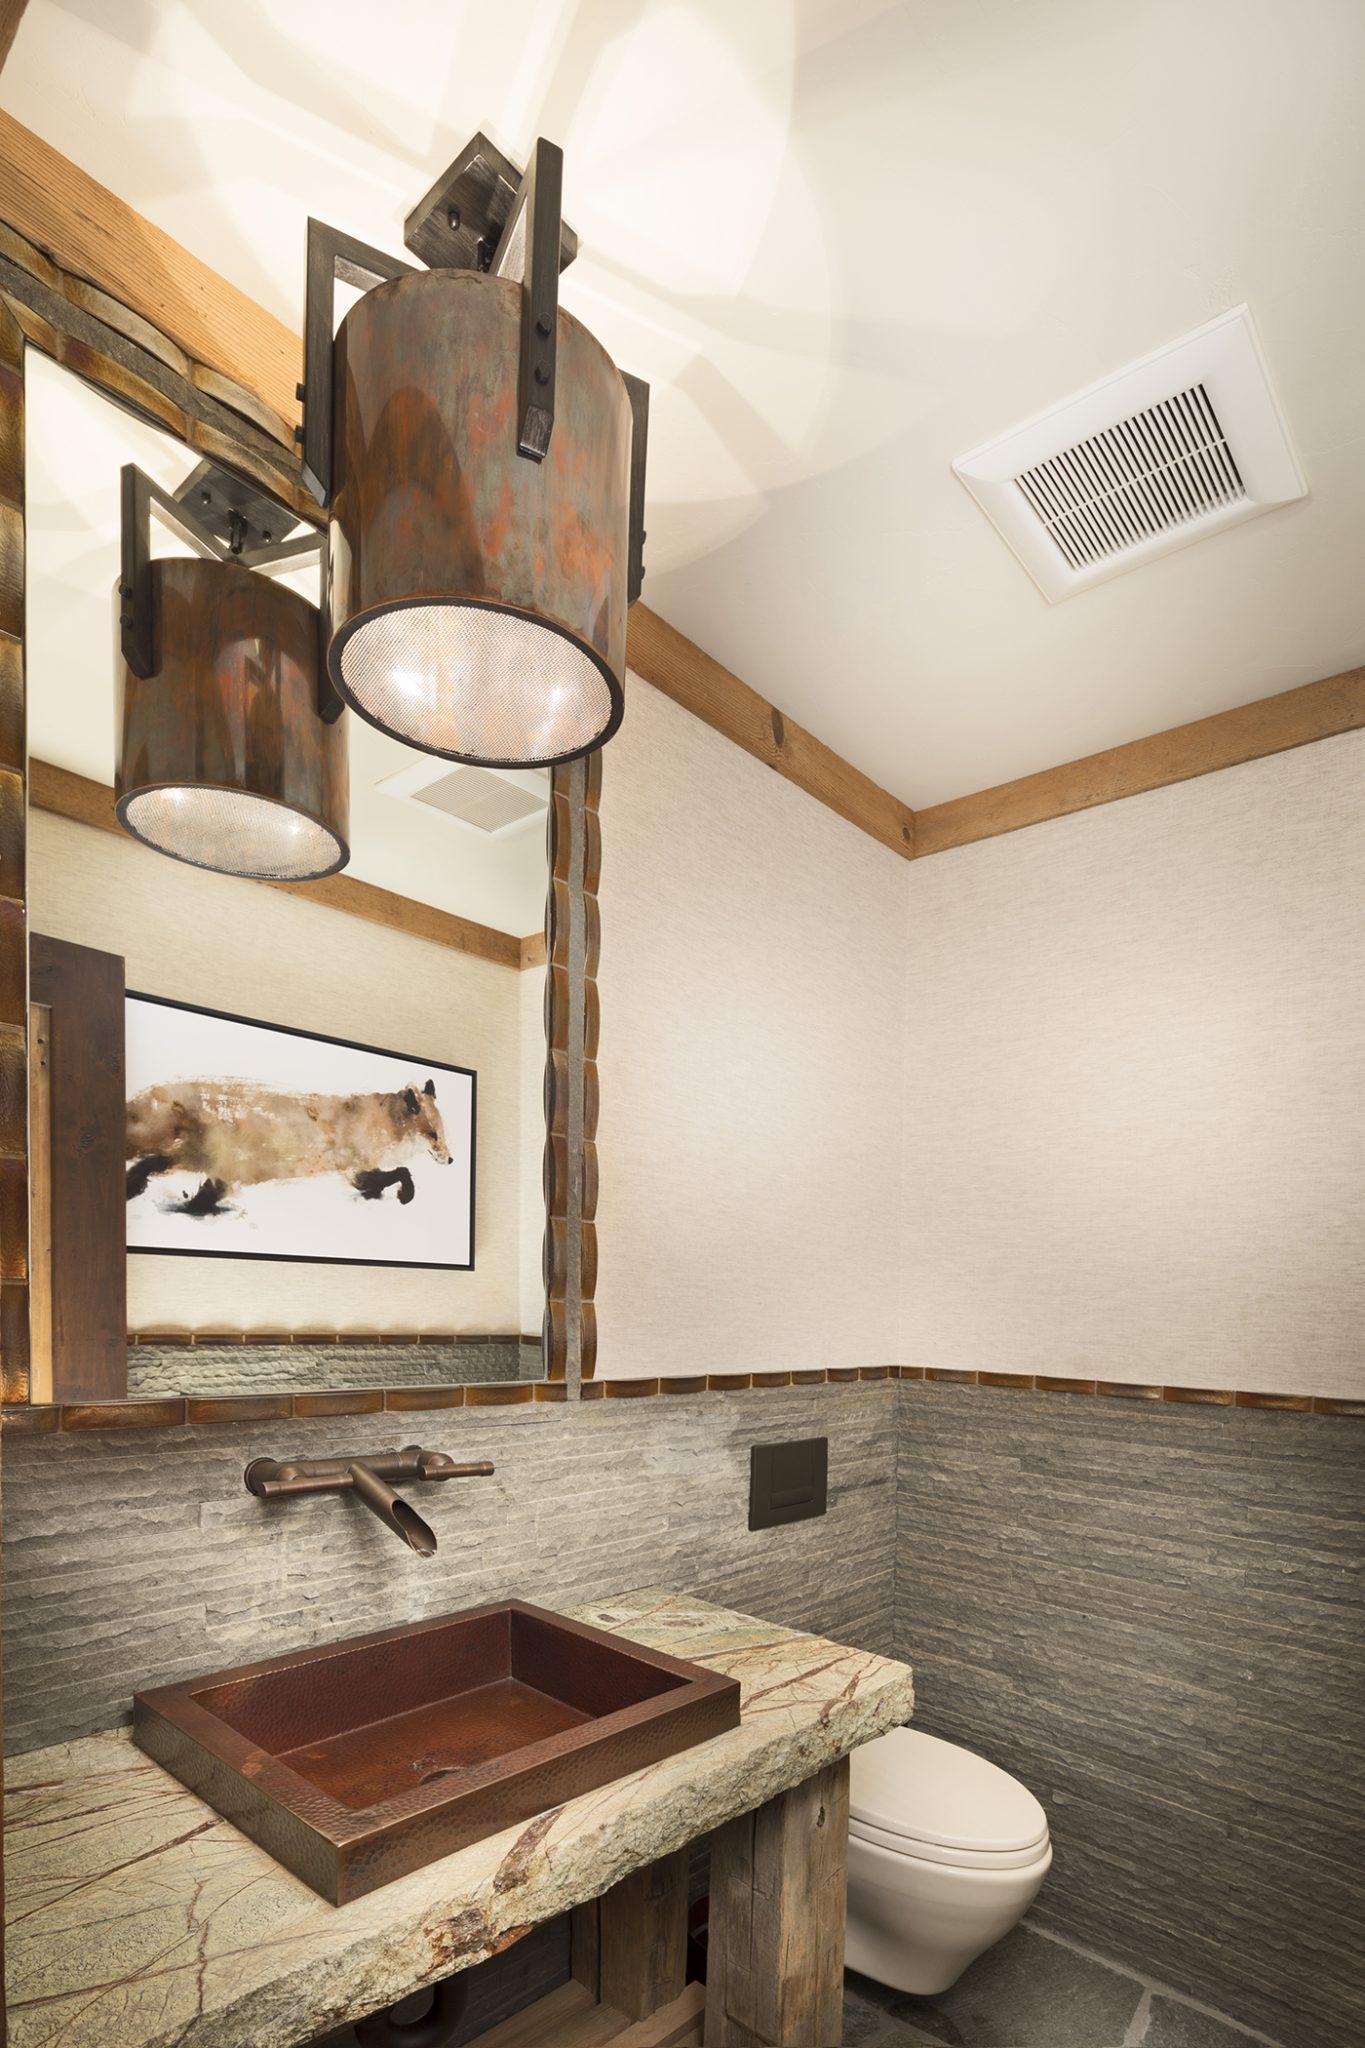 Rustic Family Lodge, Lake Tahoe, vanity slab countertop, copper sink and pendant by Aspen Leaf Interiors, Inc.